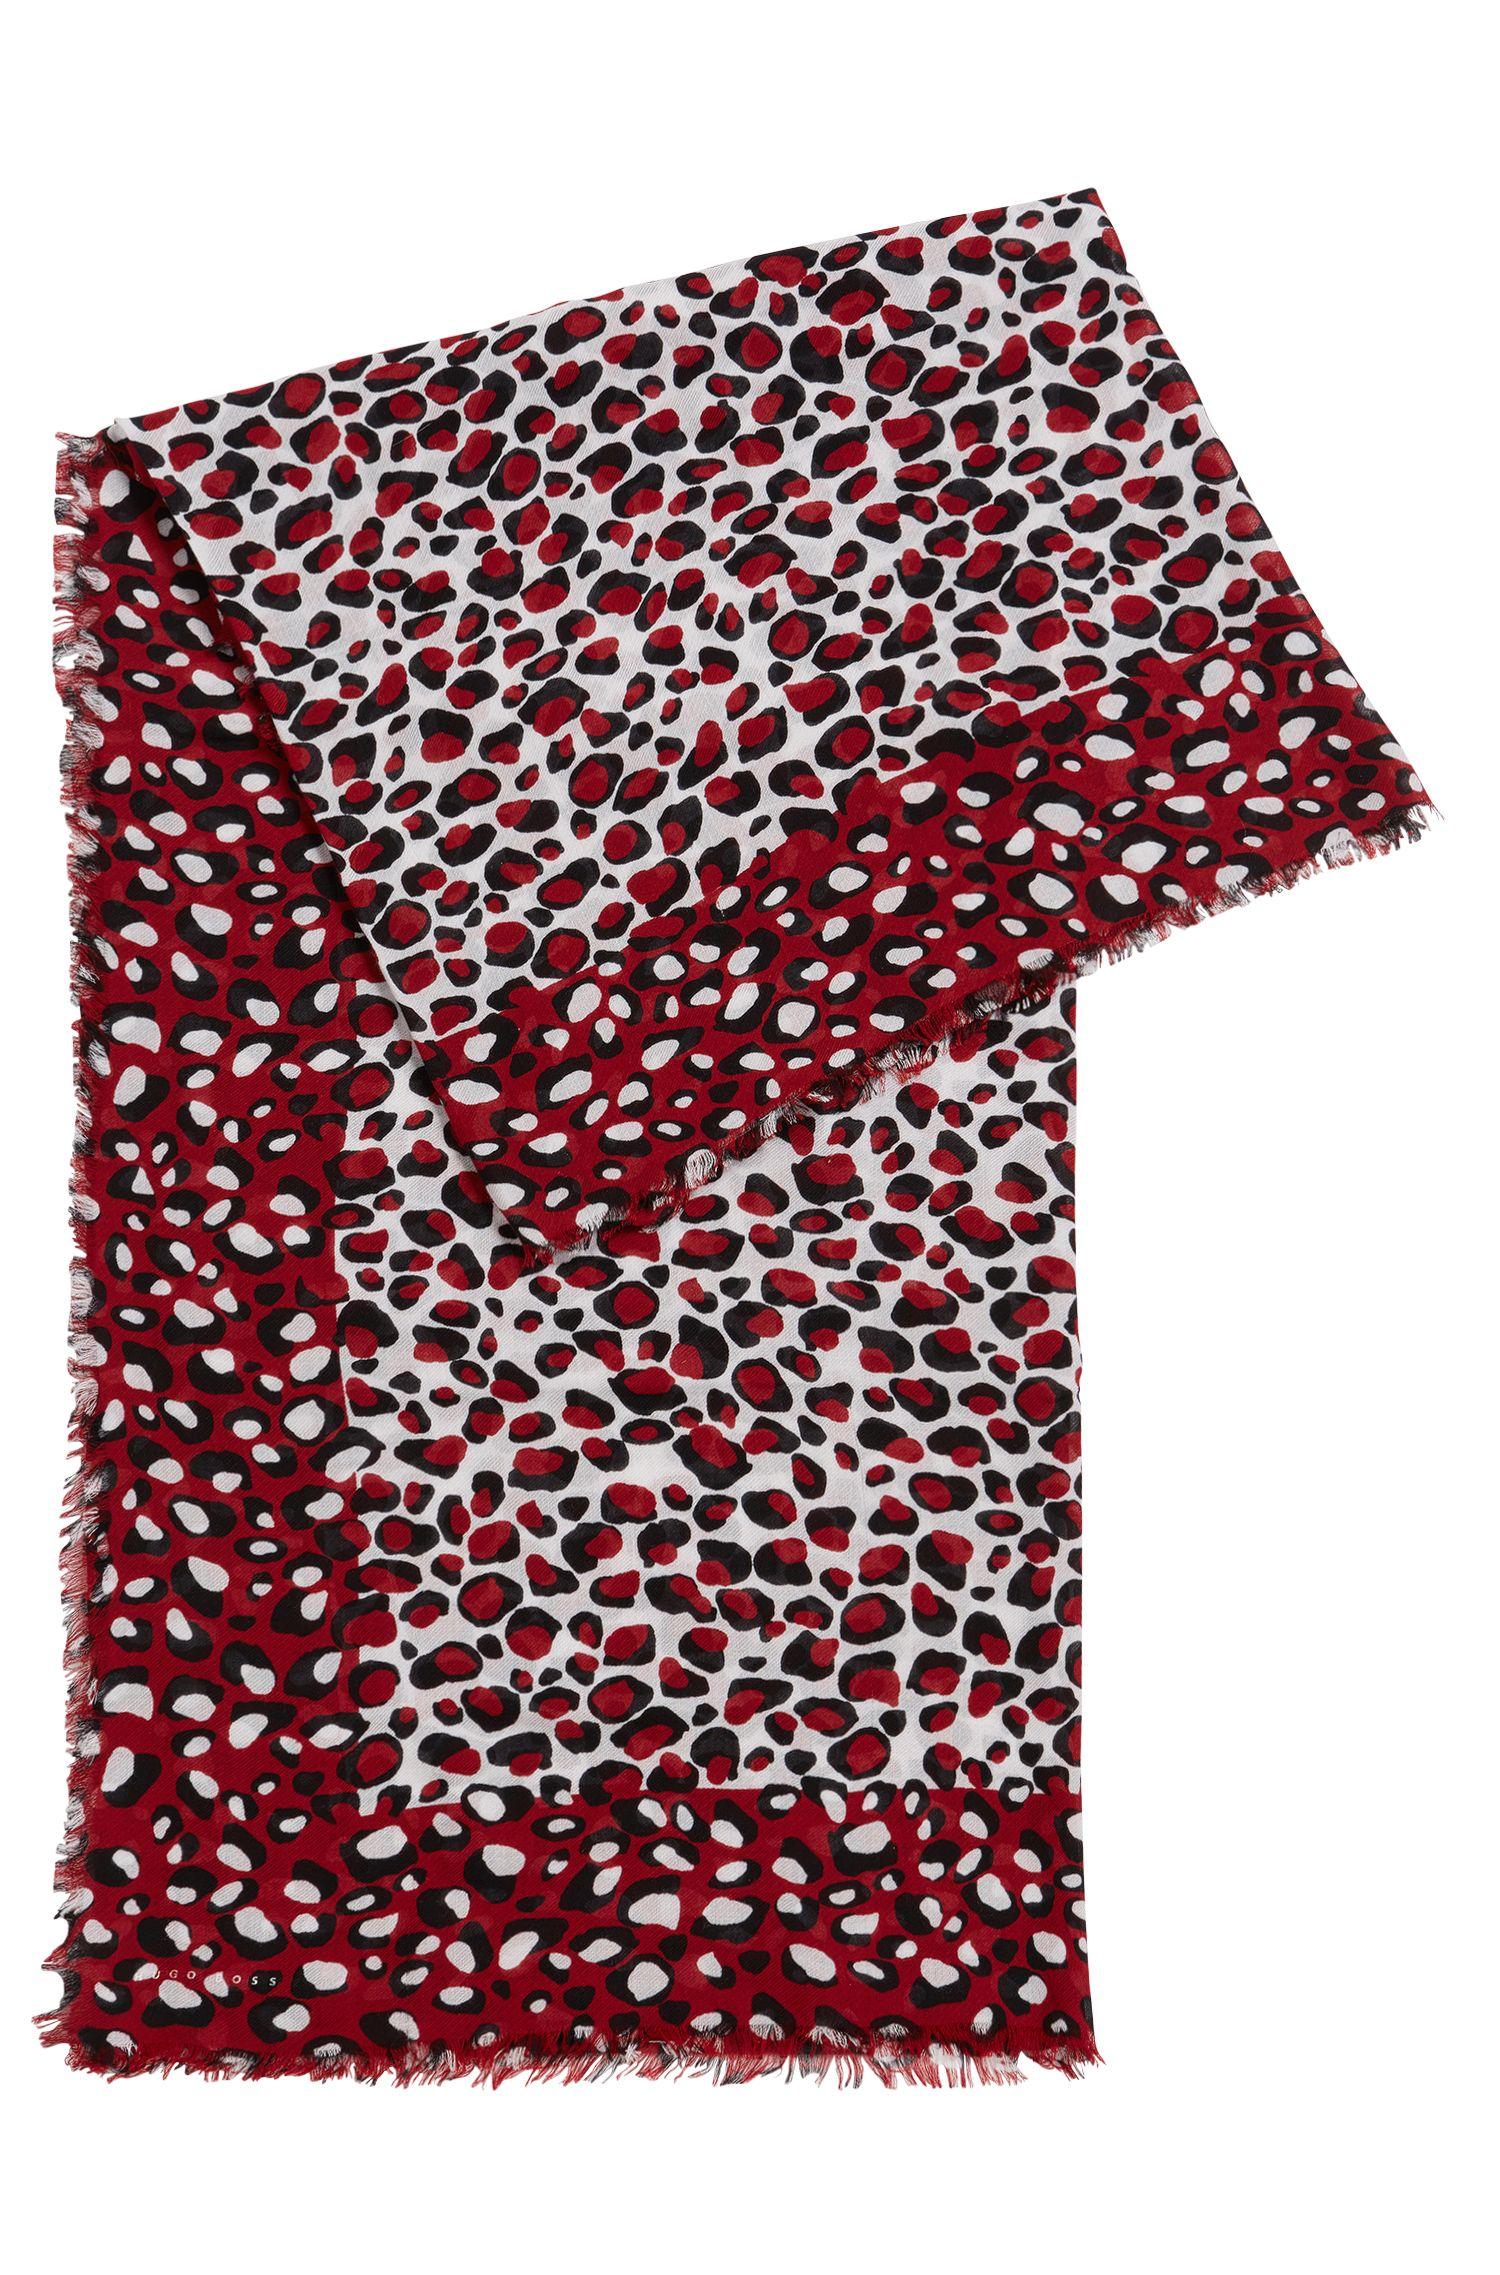 Rectangular scarf with statement giraffe print